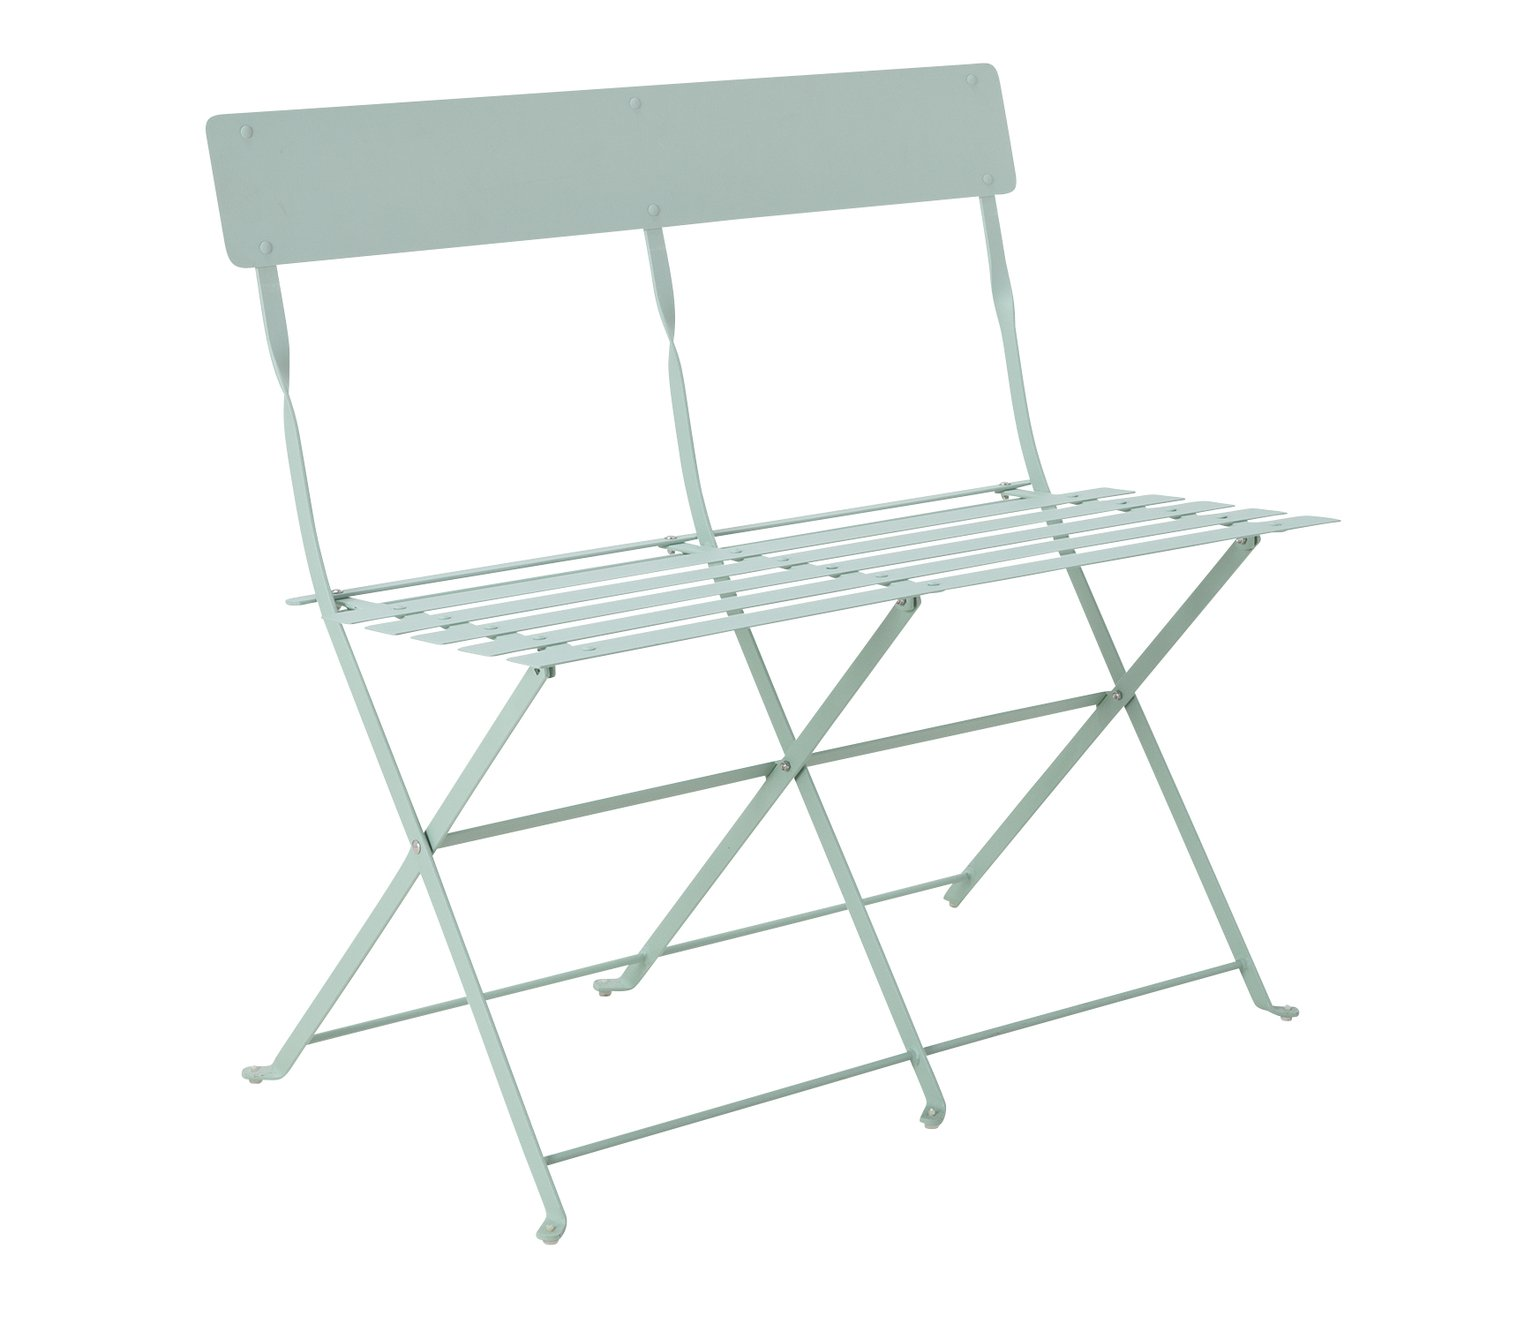 Argos Home Eve Metal 2 Seater Garden Bench - Sage Green